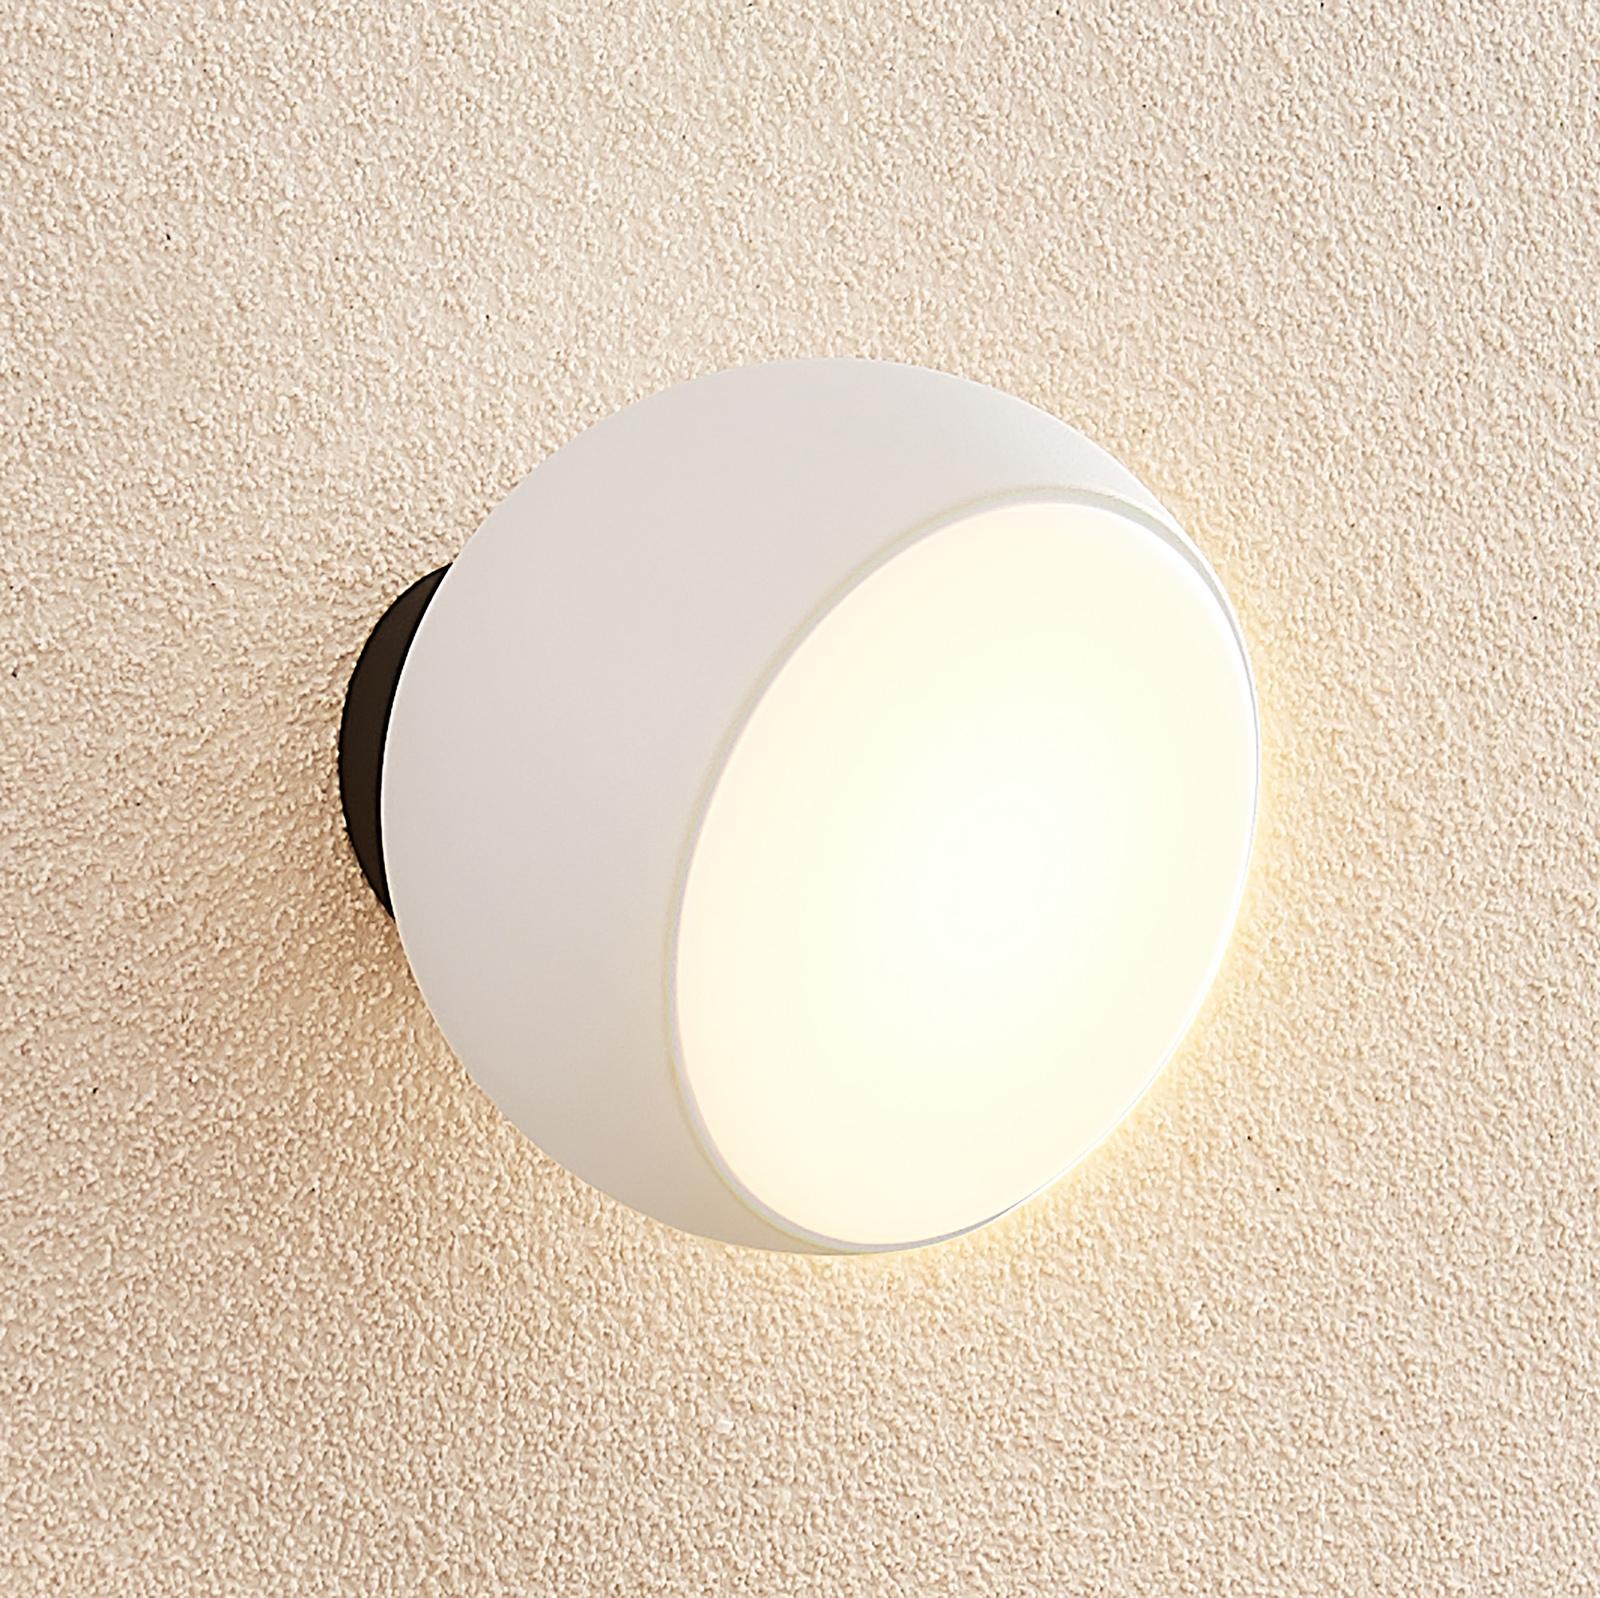 Arcchio Davir LED-vegglampe, bærbar, batteri, hvit